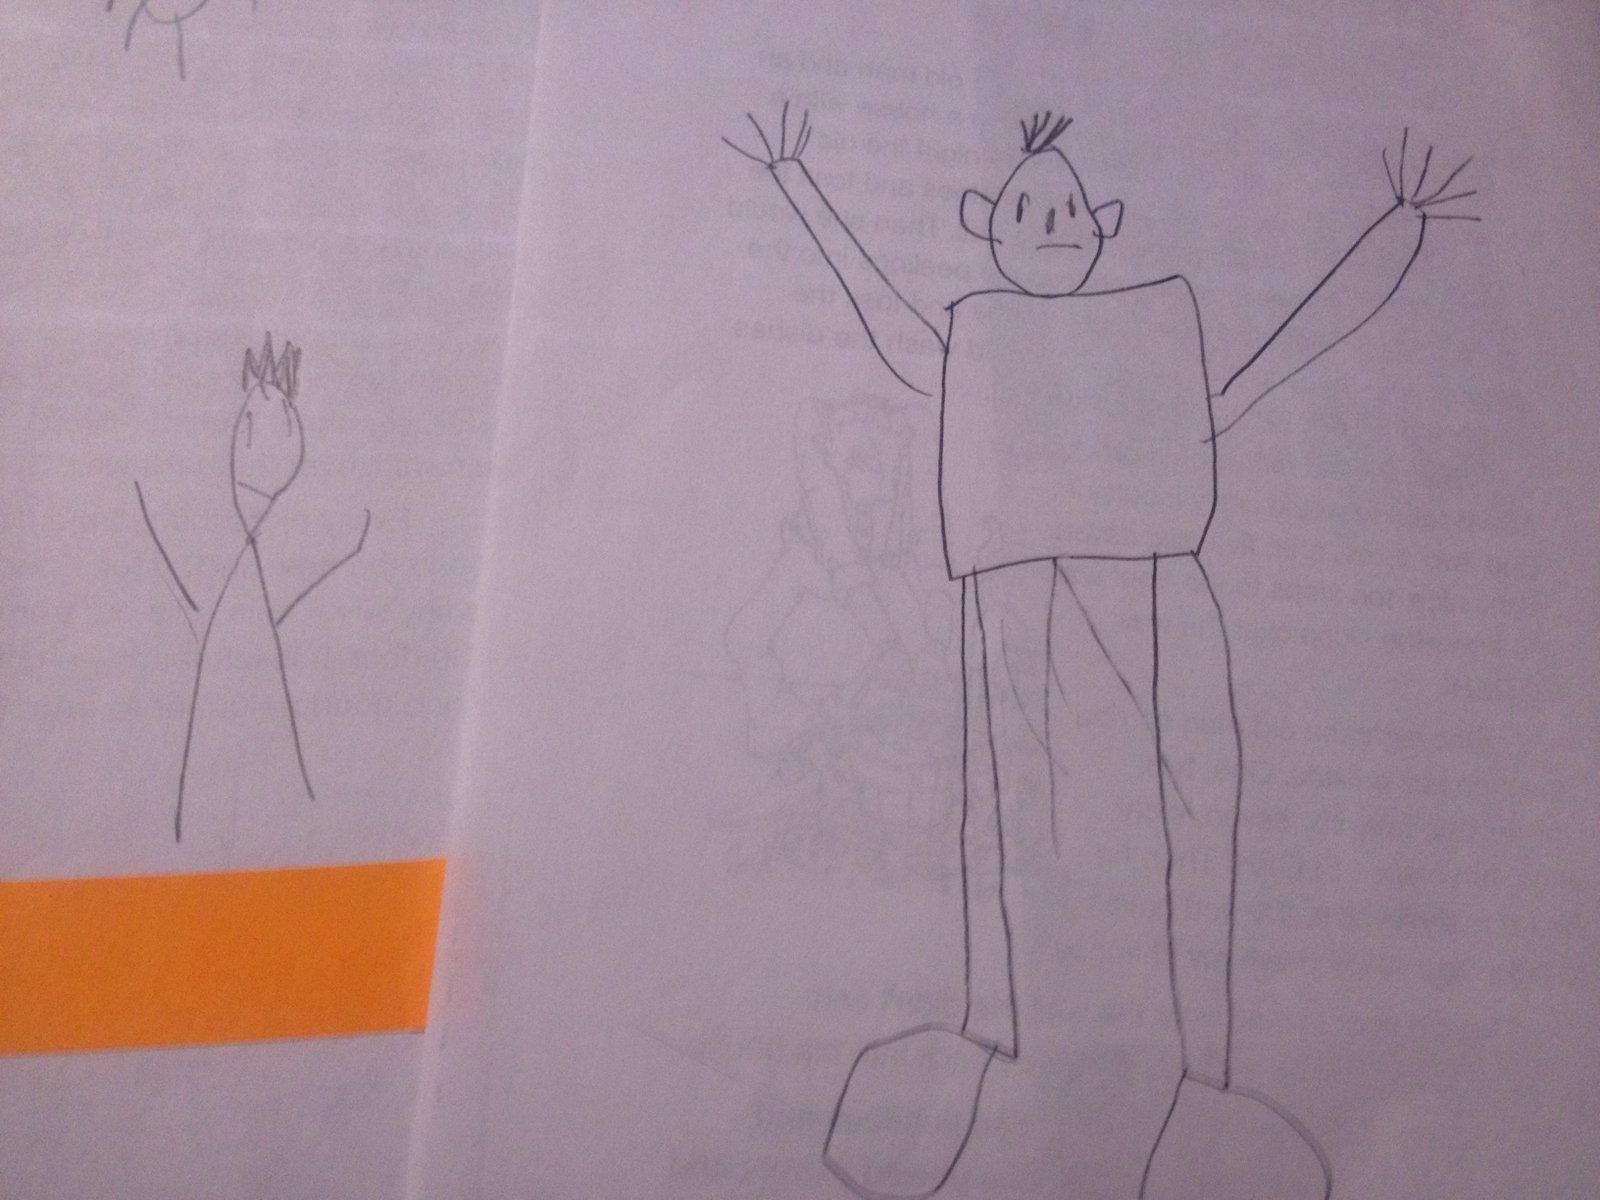 1600x1200 Mat Man Teach A Child How To Draw A Person Using Handwriting